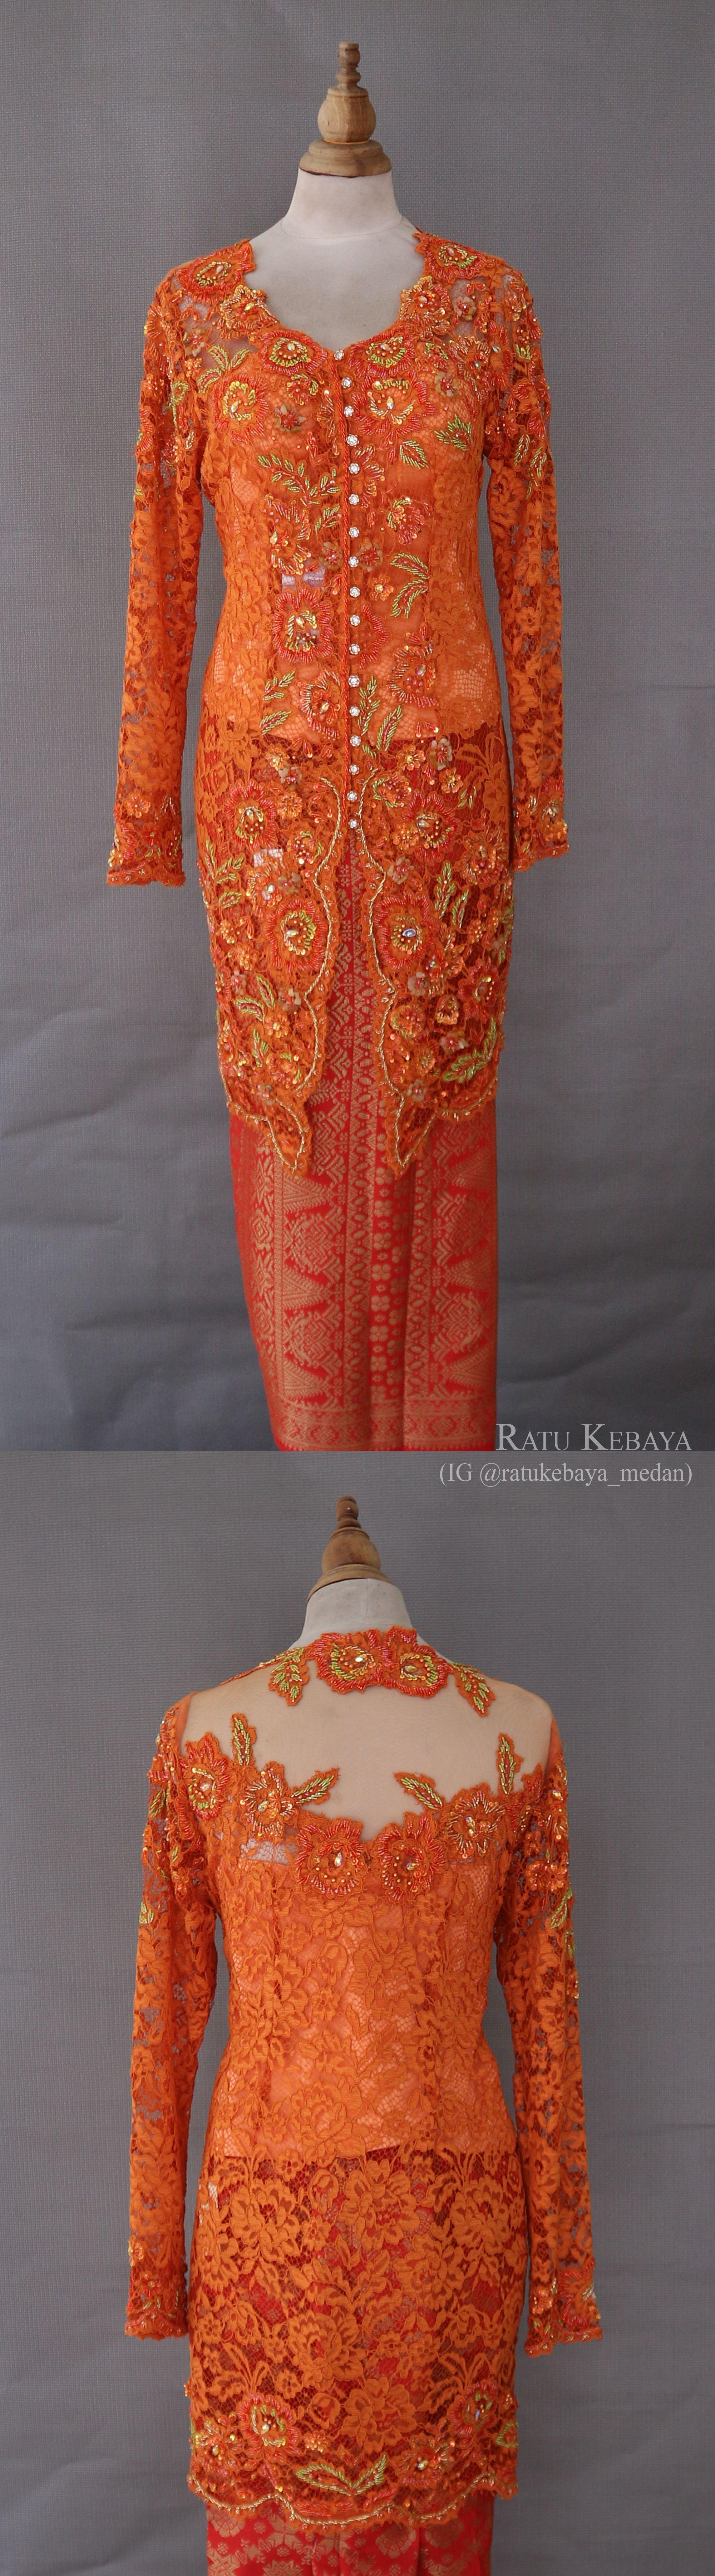 Kebaya Orange Dengan Detail Payet Senada Ig Ratukebaya Medan